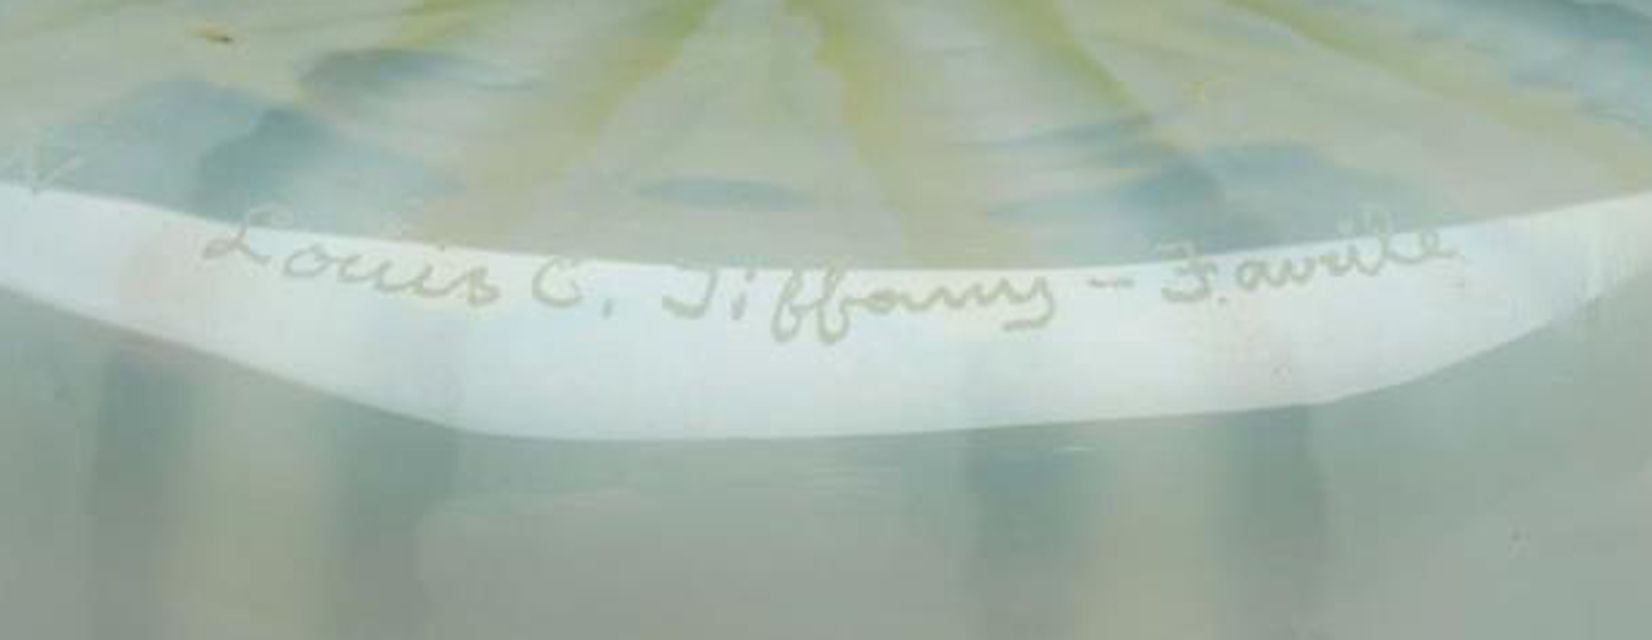 Louis C. Tiffany - Favrile Mark